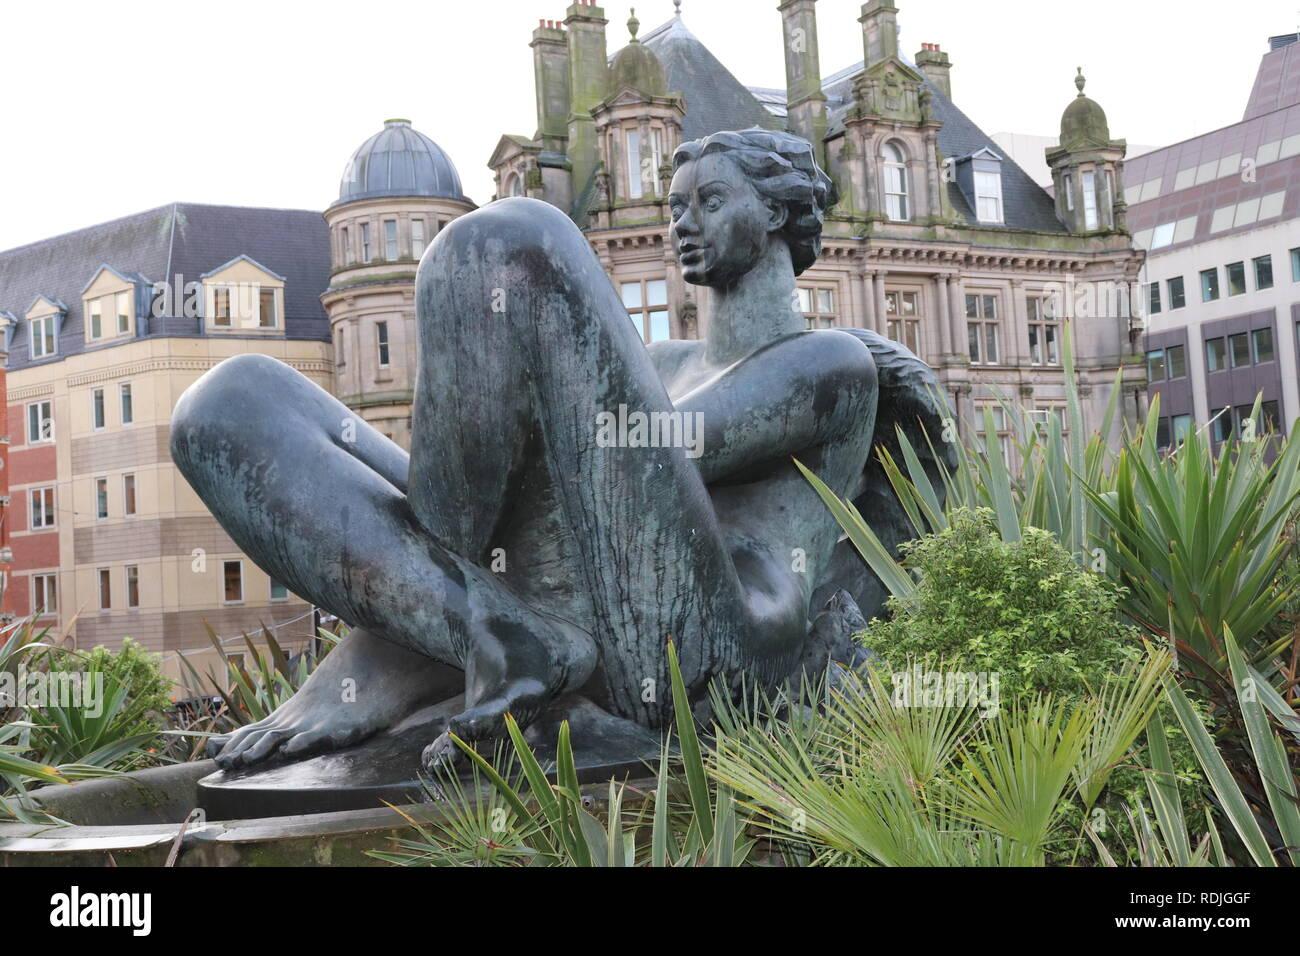 Floozy in the Jacuzzi Birmingham City Statue - Stock Image